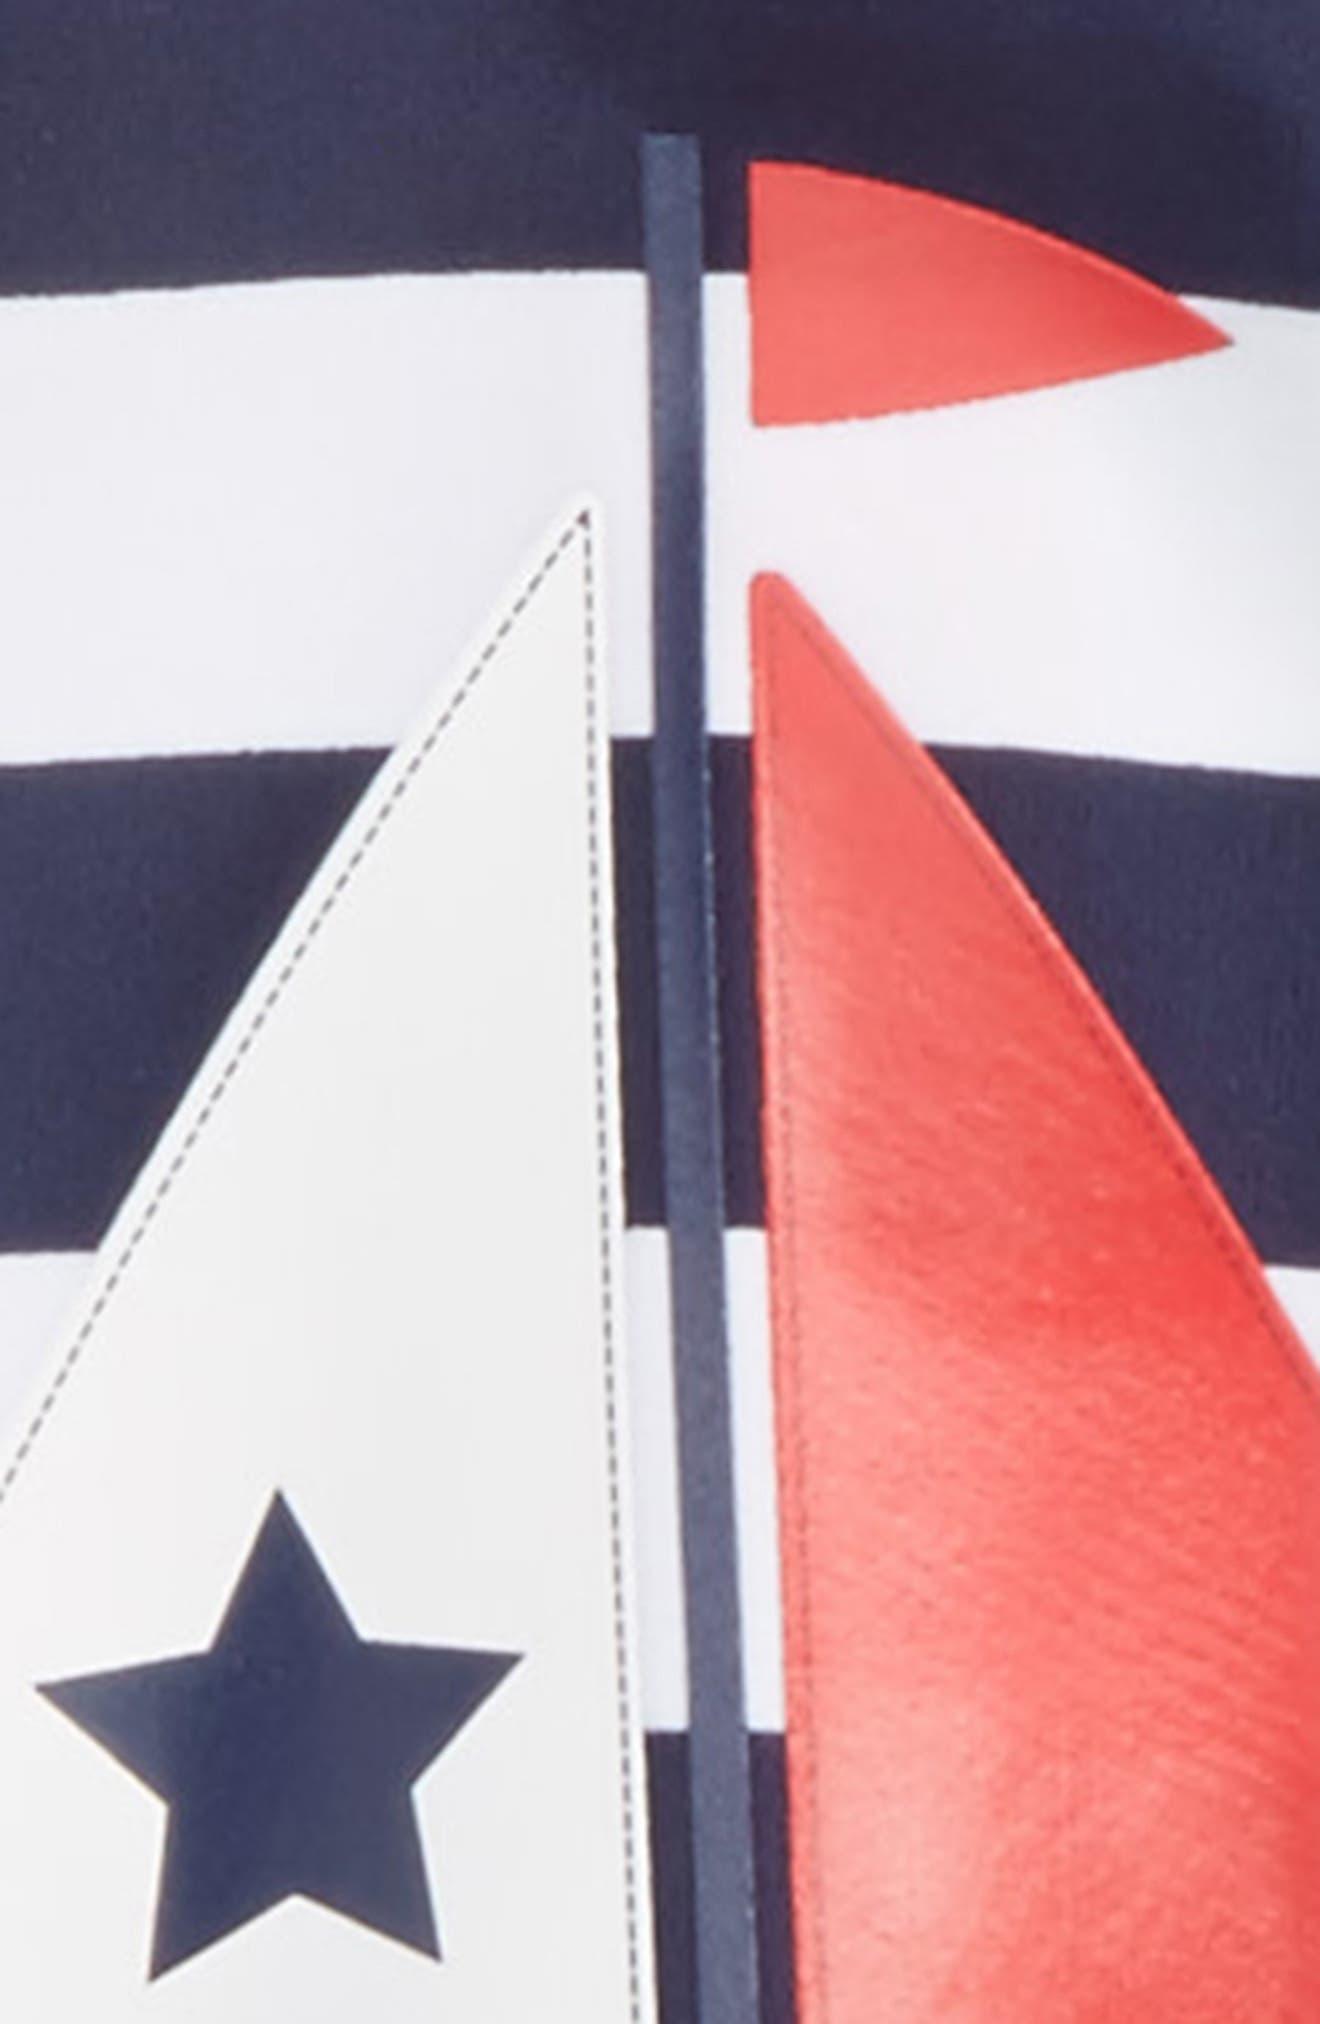 Sailboat UPF 50+ One-Piece Rashguard Swimsuit,                             Alternate thumbnail 2, color,                             Navy/ White